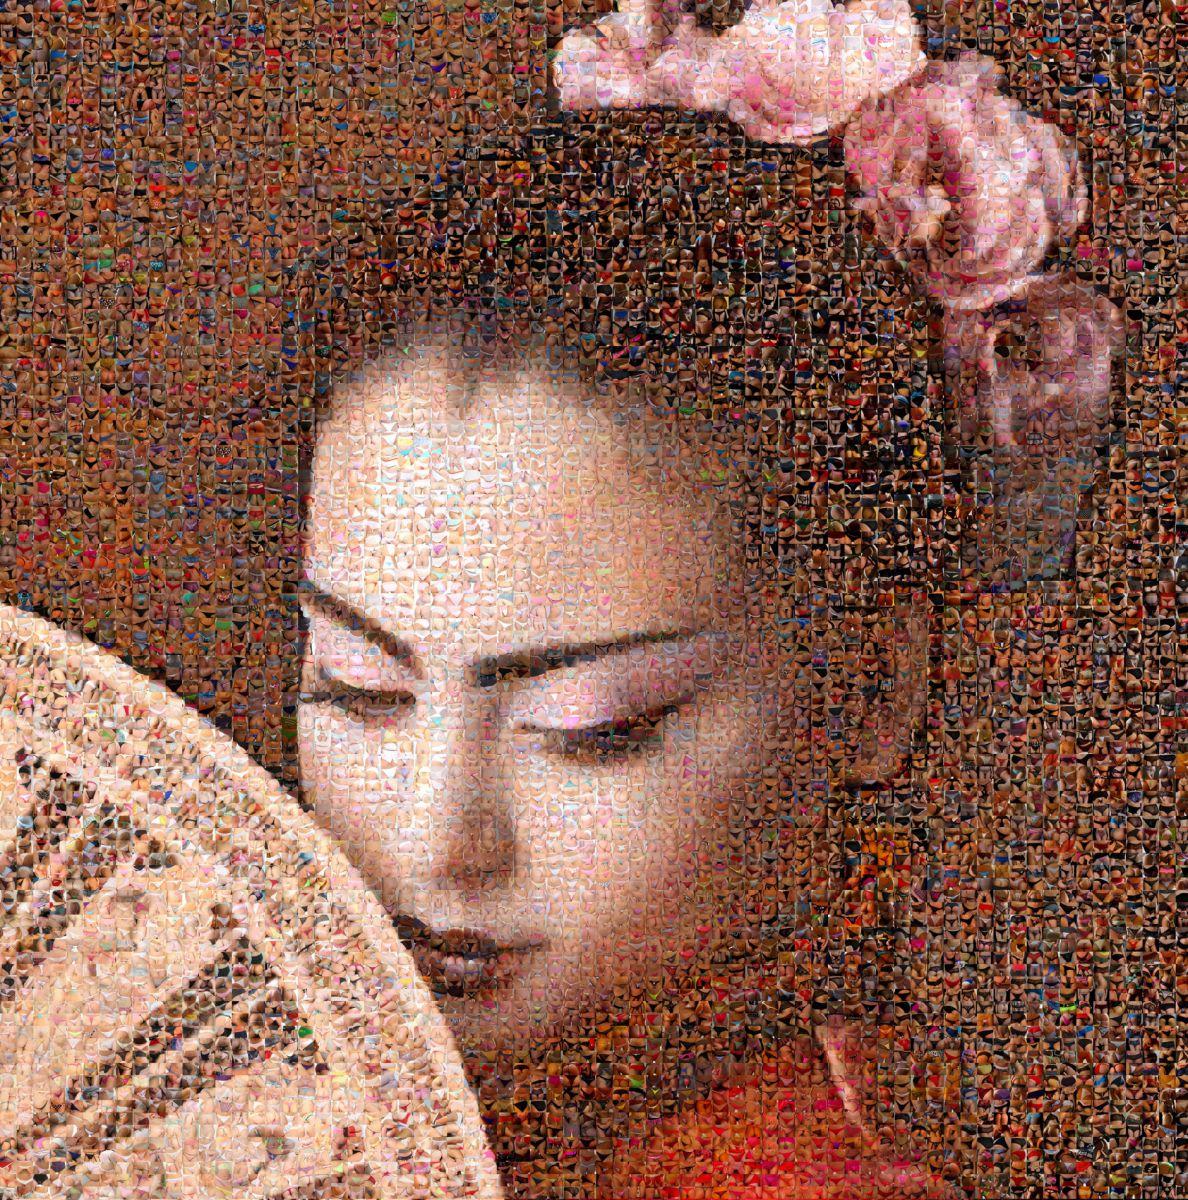 Geisha shy